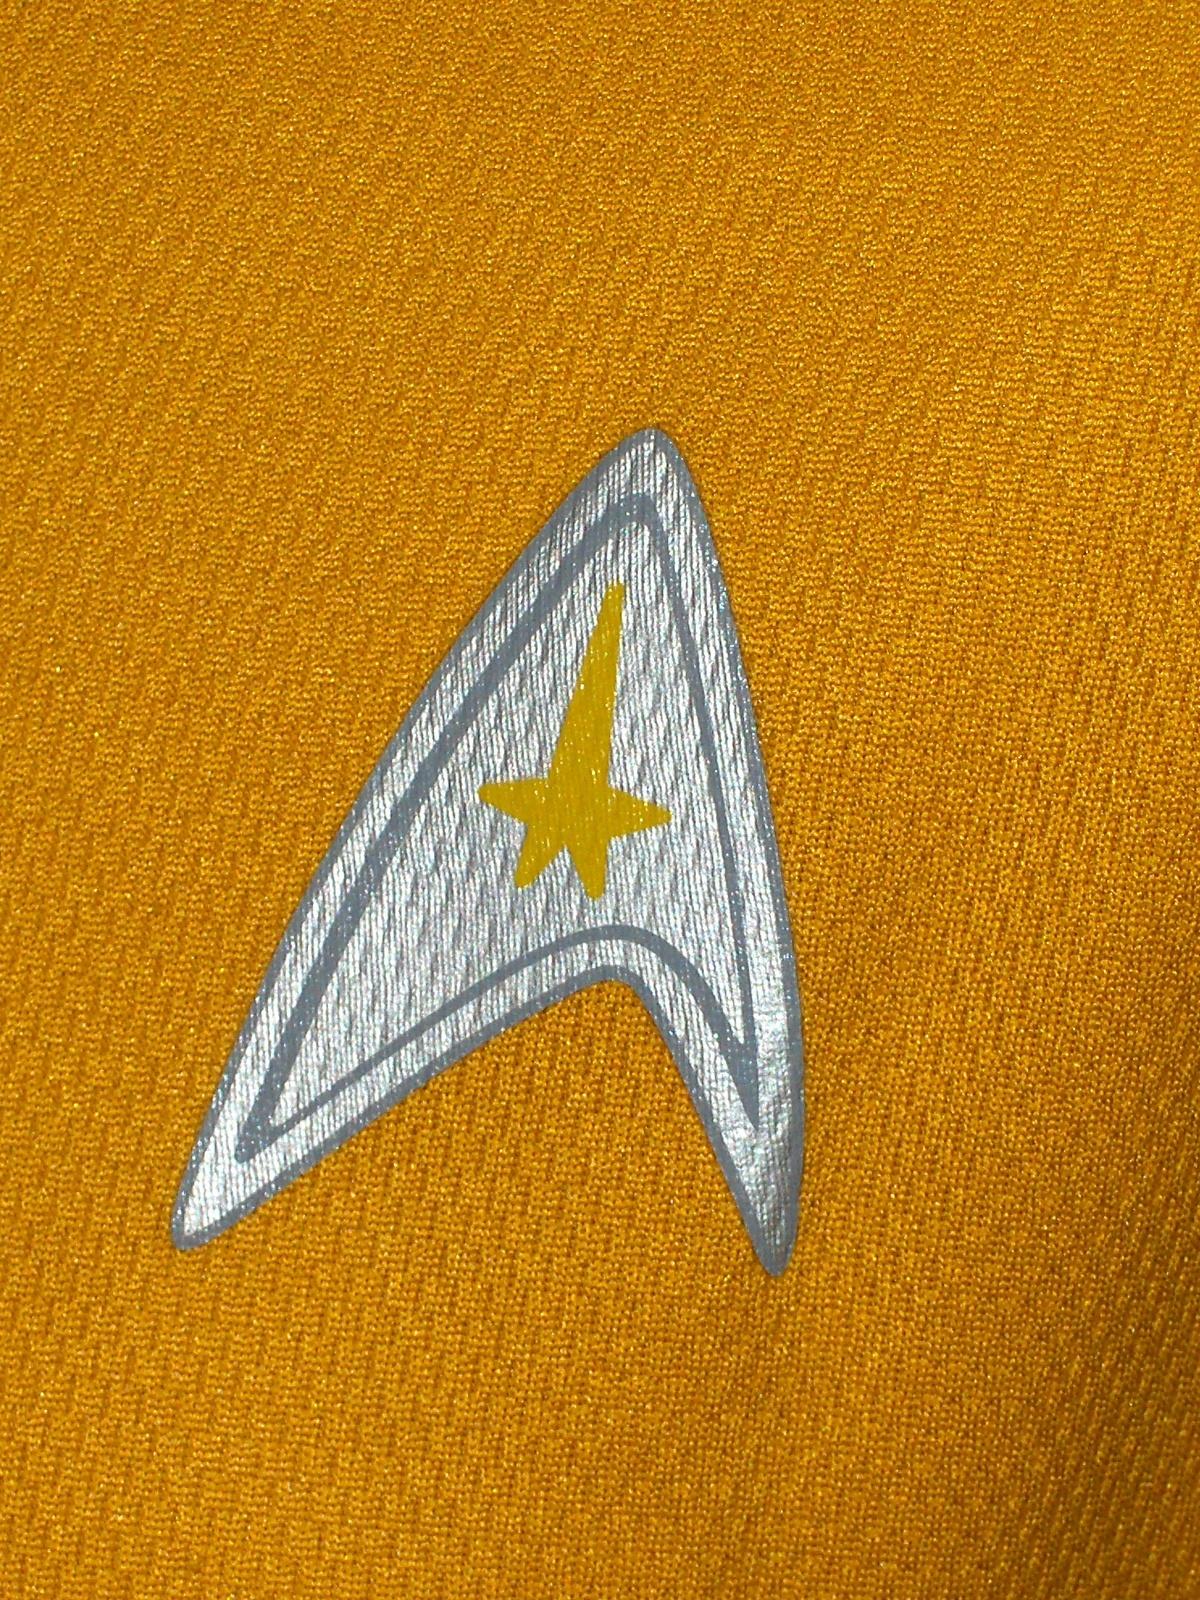 Kellogg's Star Trek Yellow T-Shirt Unisex Size Large  2009